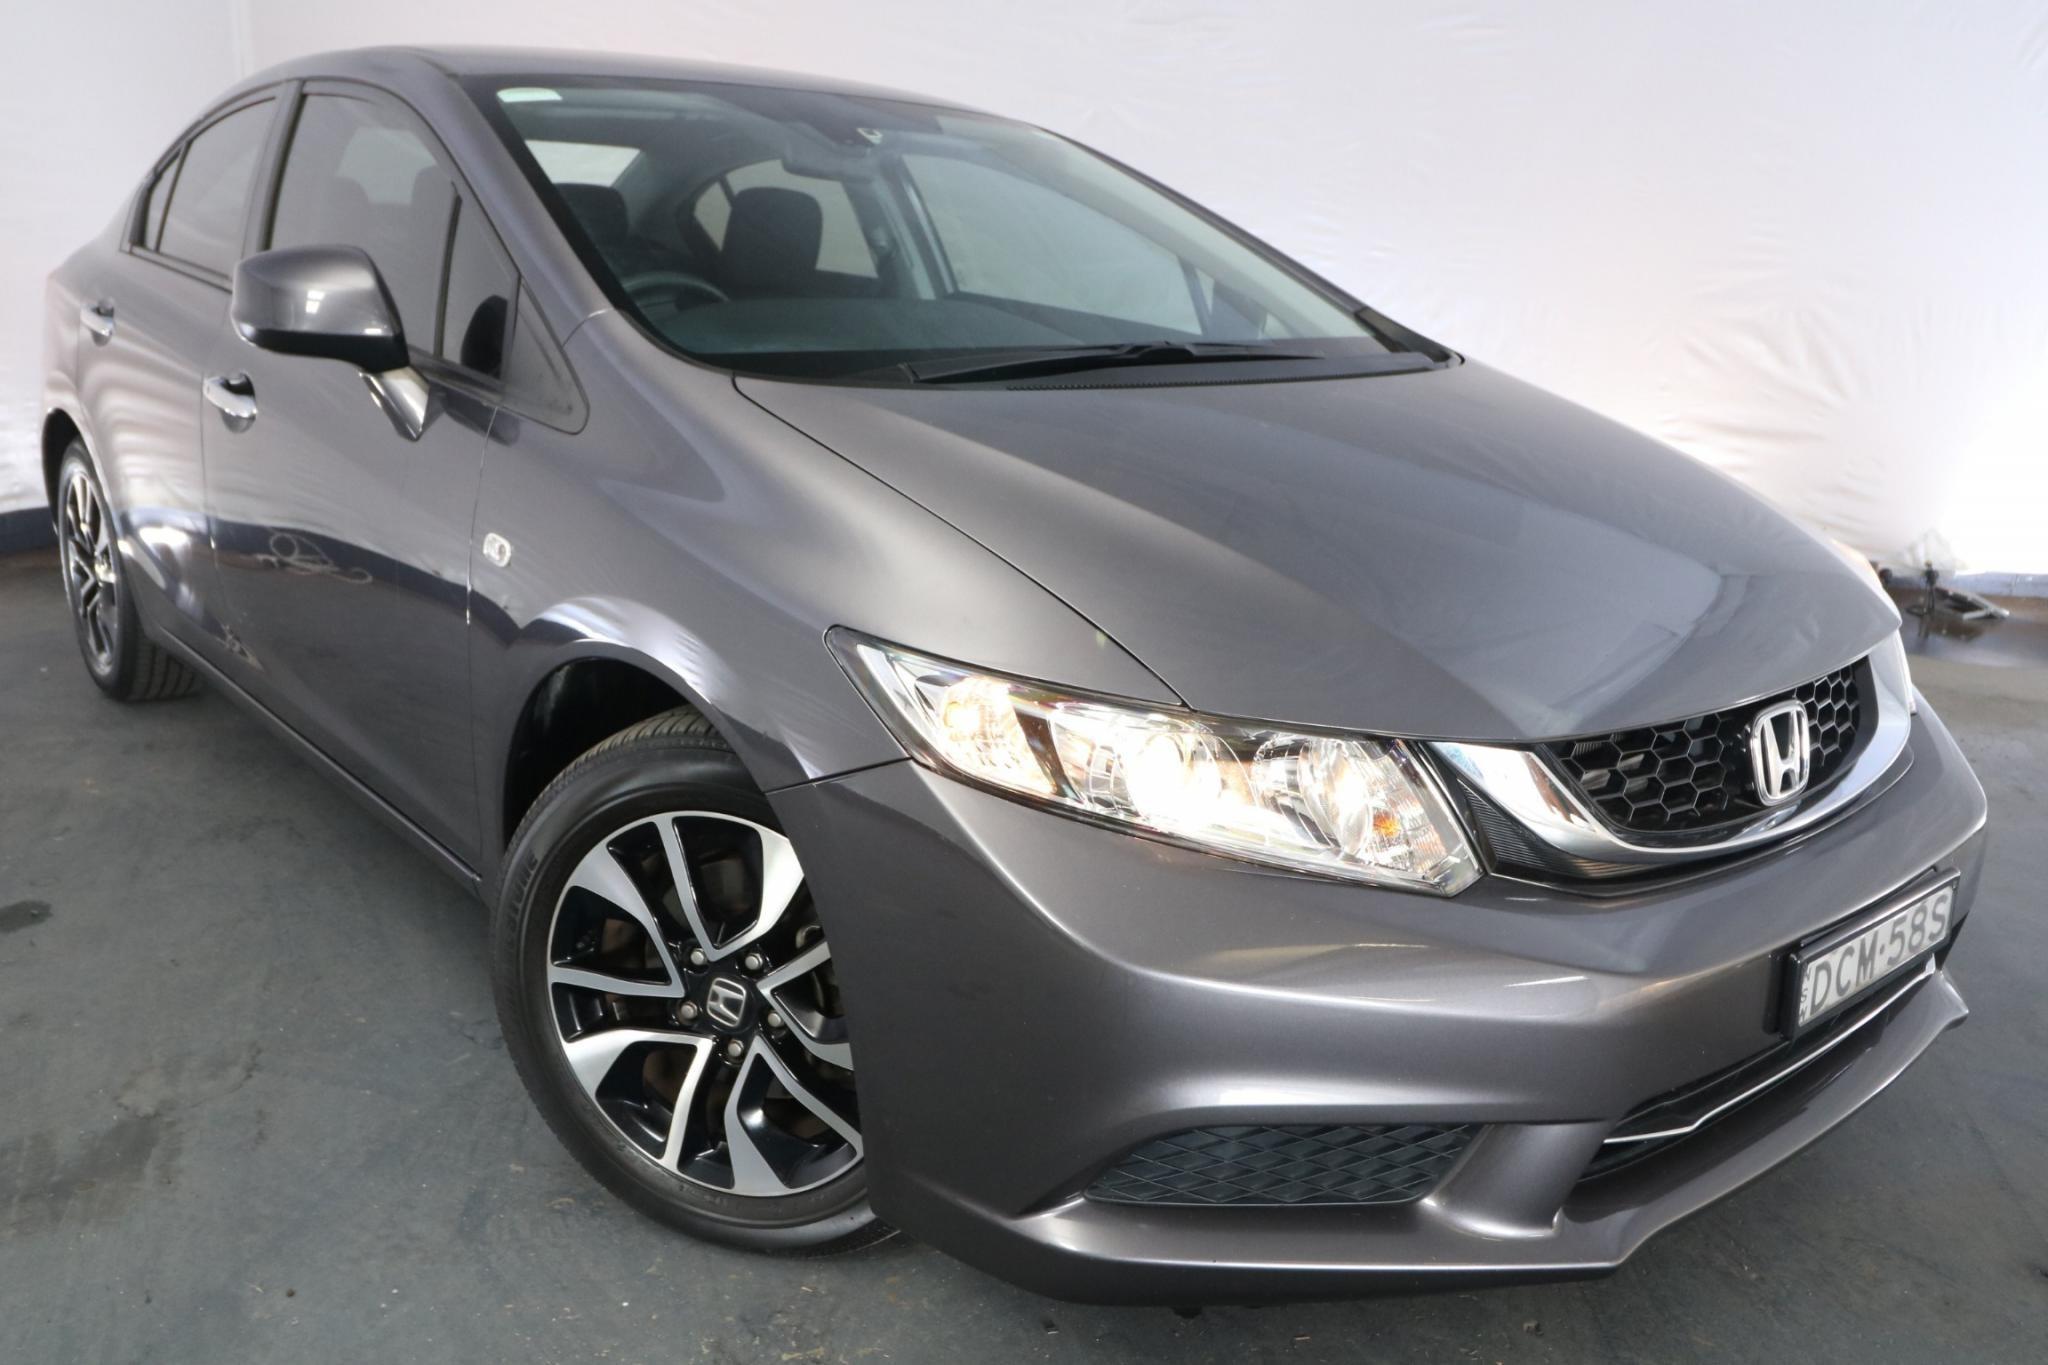 2015 Honda Civic VTi-S SERIES 2 MY15 / 5 Speed Automatic / Sedan / 1.8L / 4 Cylinder / Petrol / 4x2 / 4 door / Model Year '15 November release SBC15A